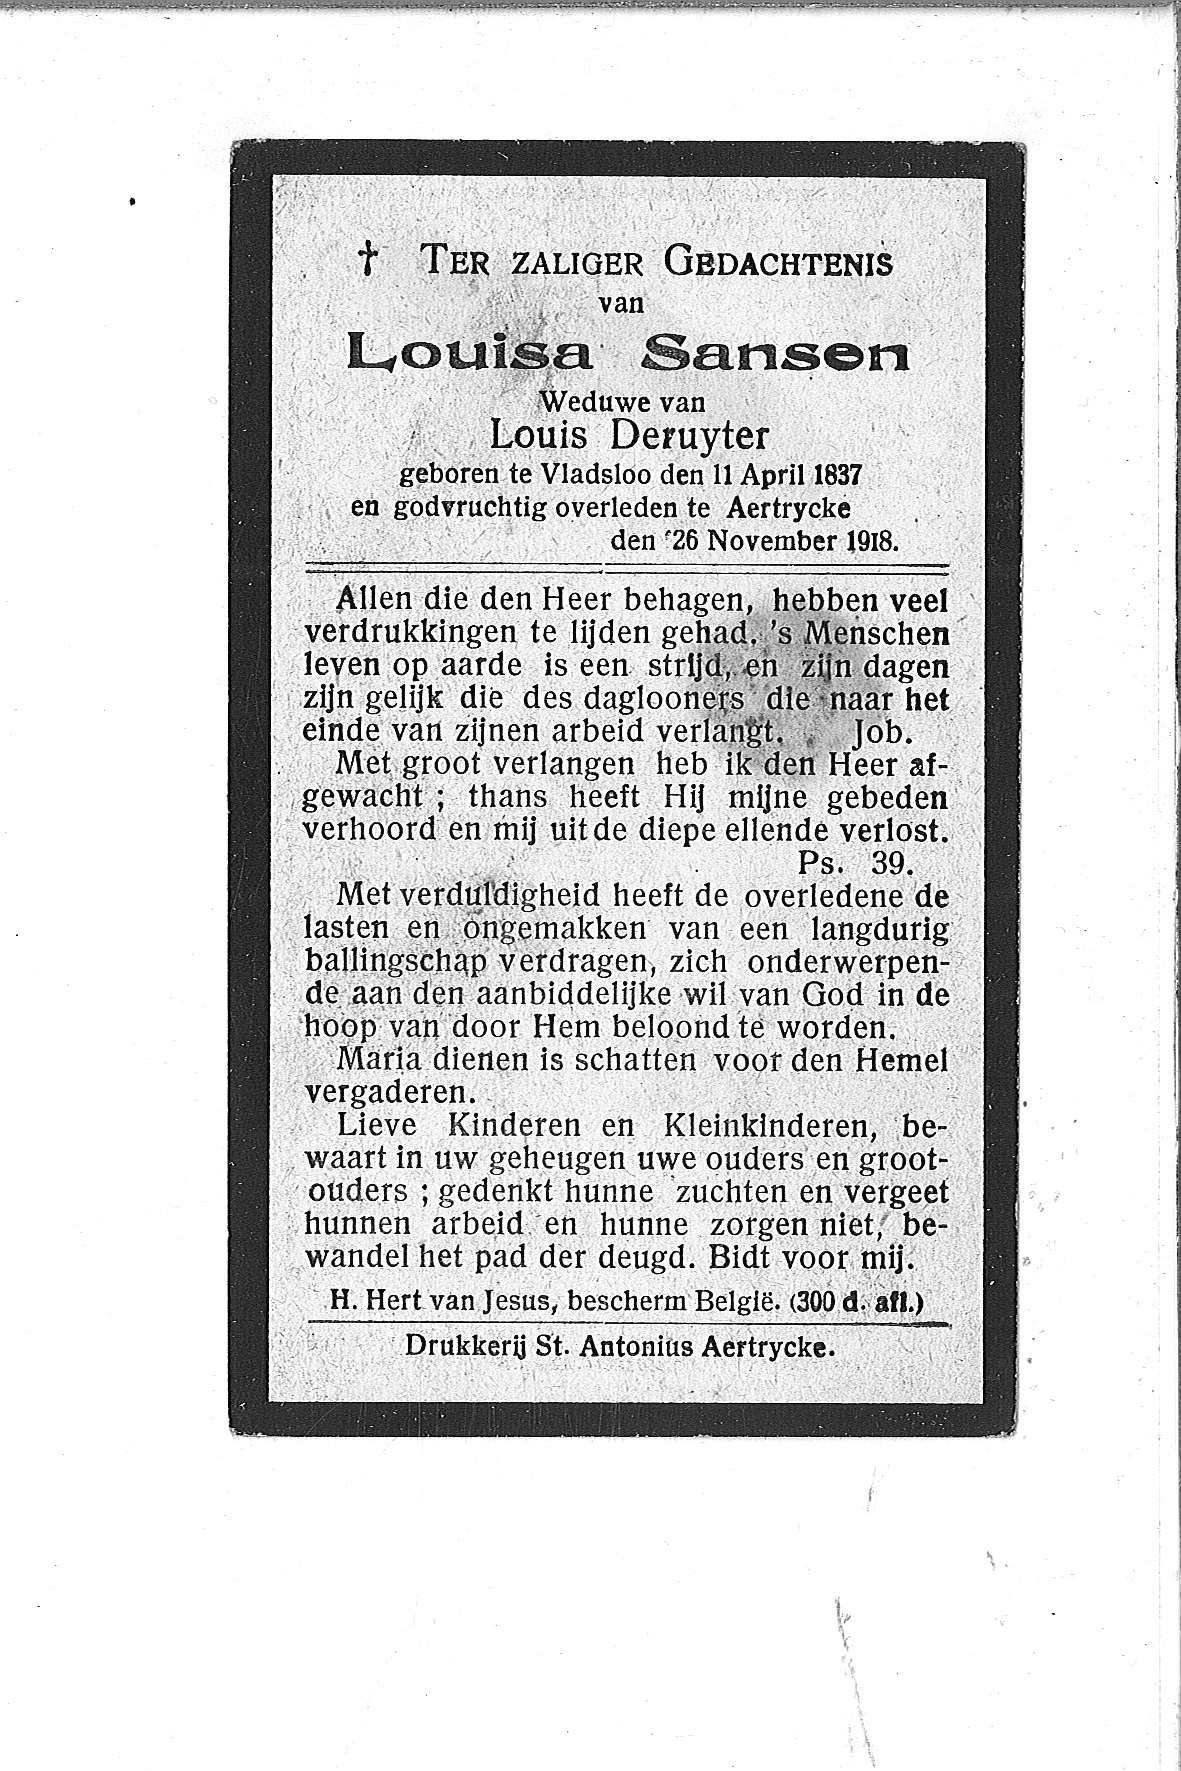 Louisa(1918)20131104101221_00043.jpg